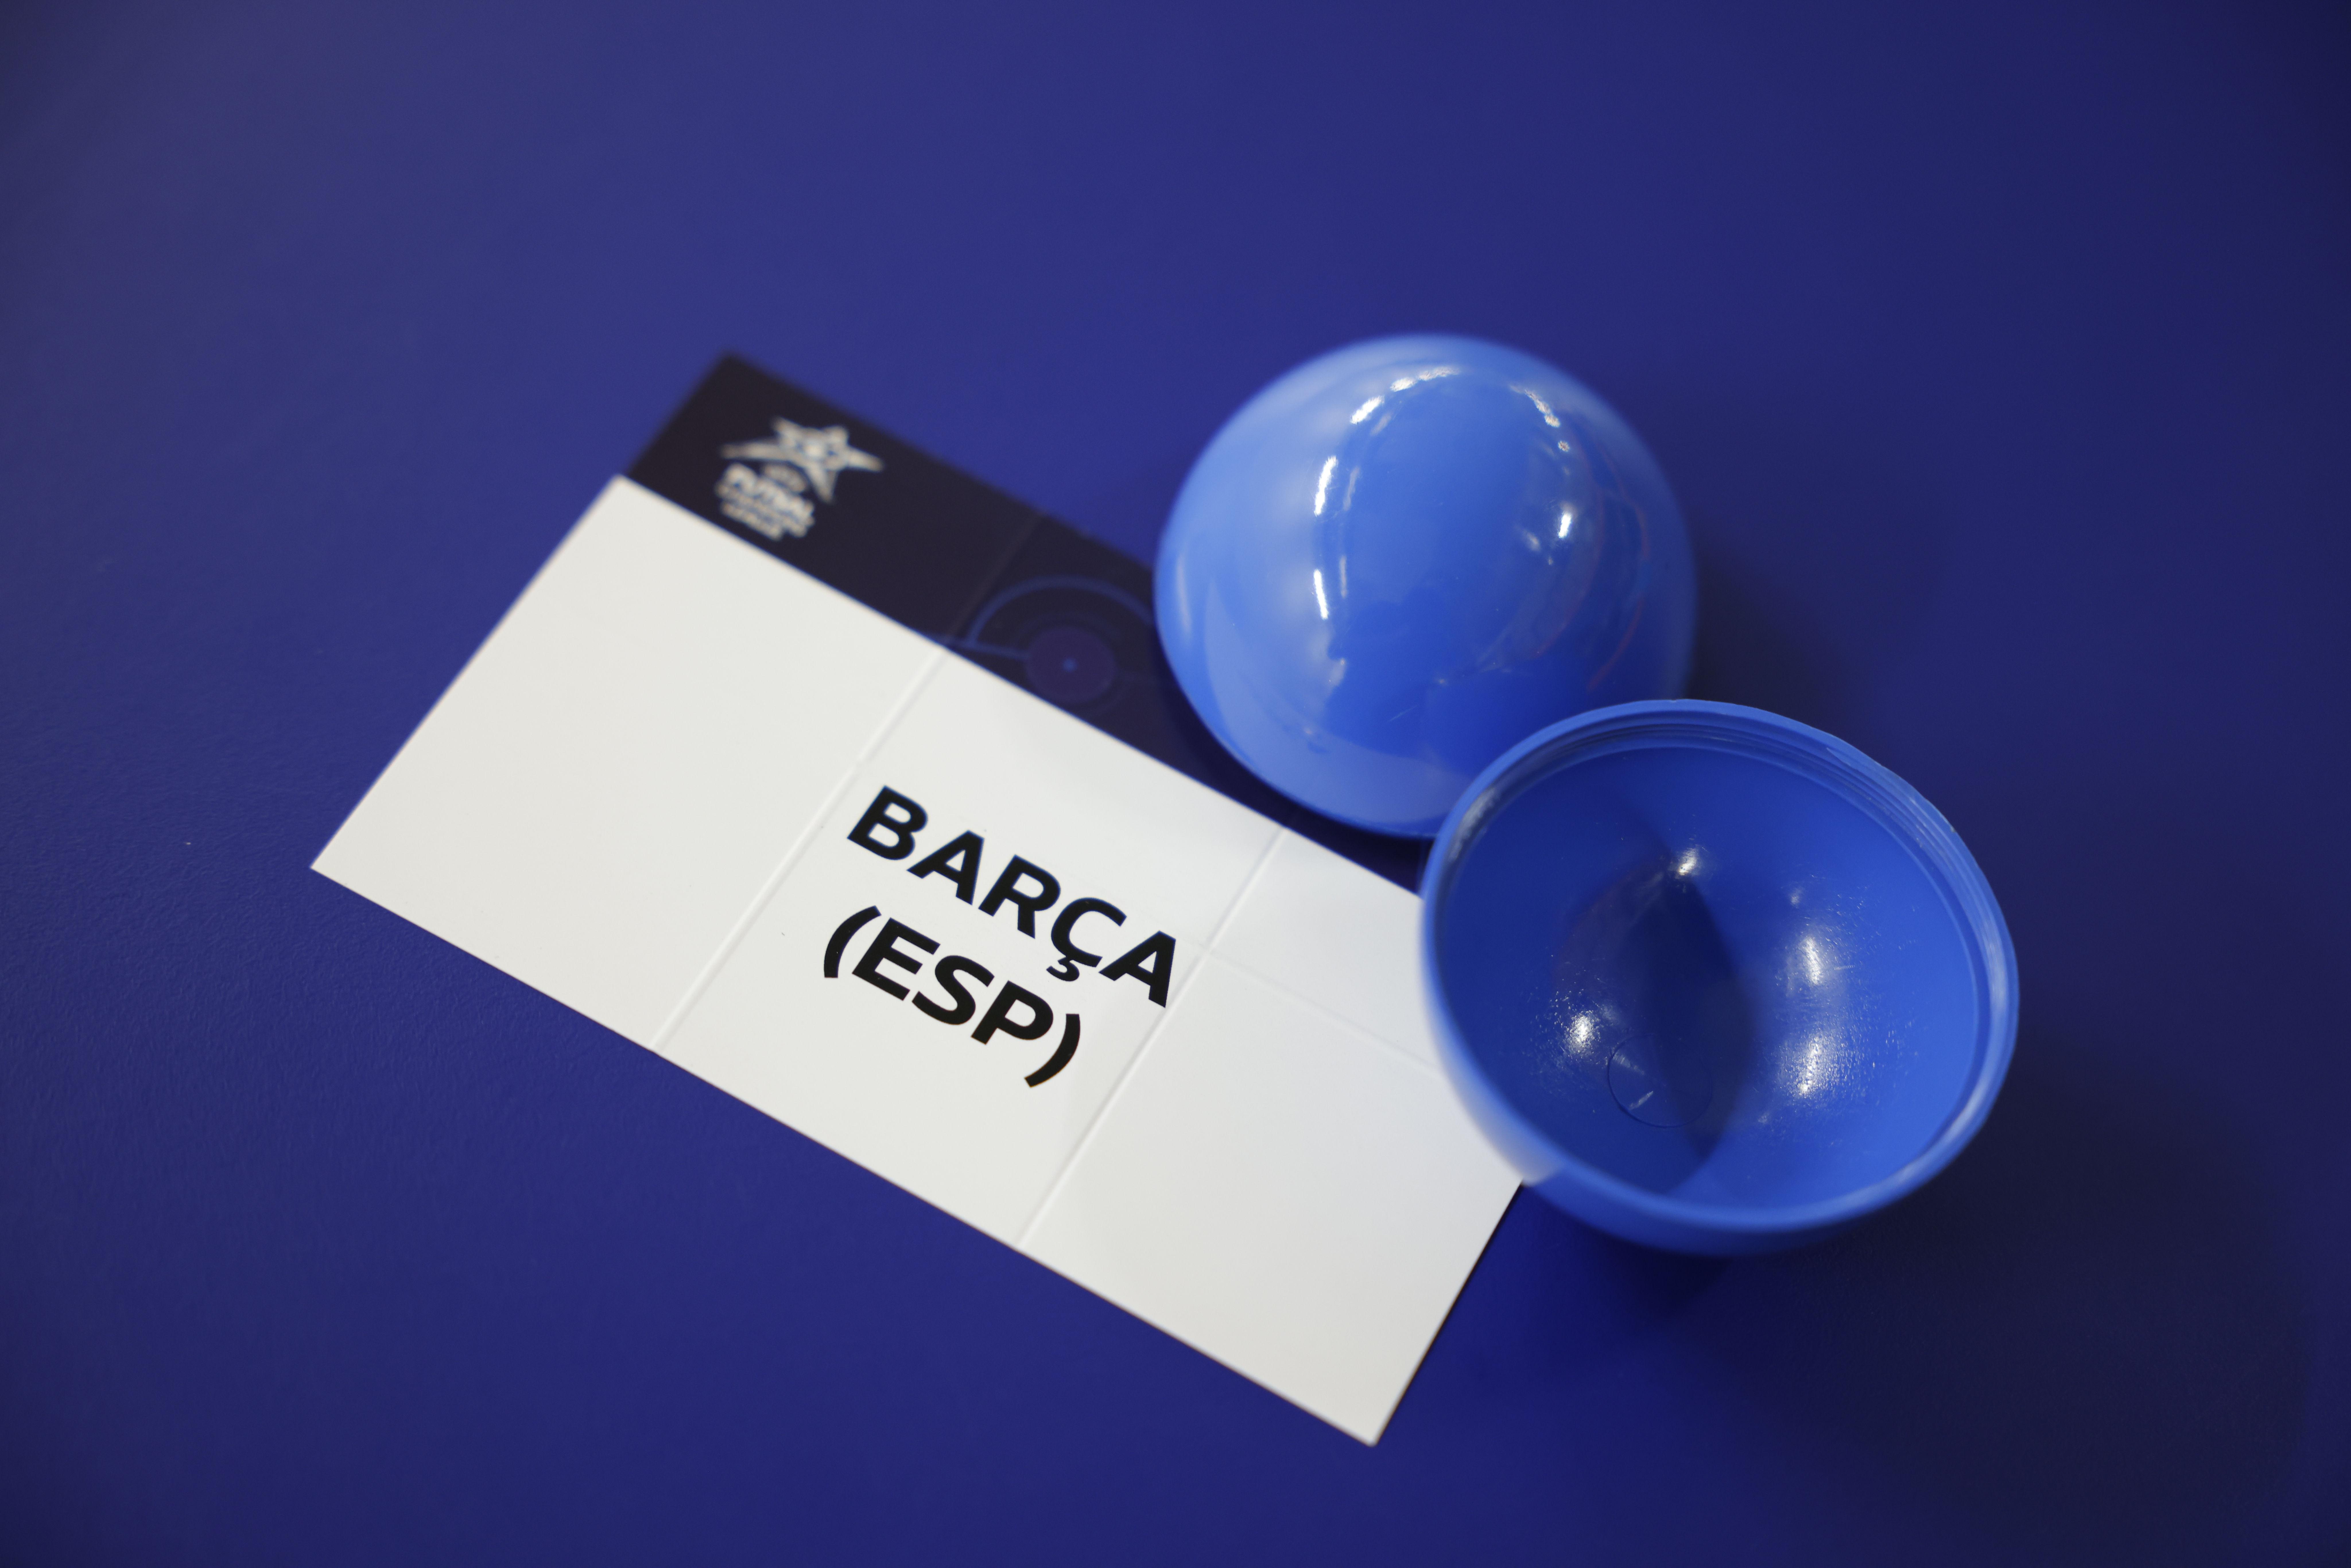 UEFA Futsal Champions League 2021/22 Main Round Draw